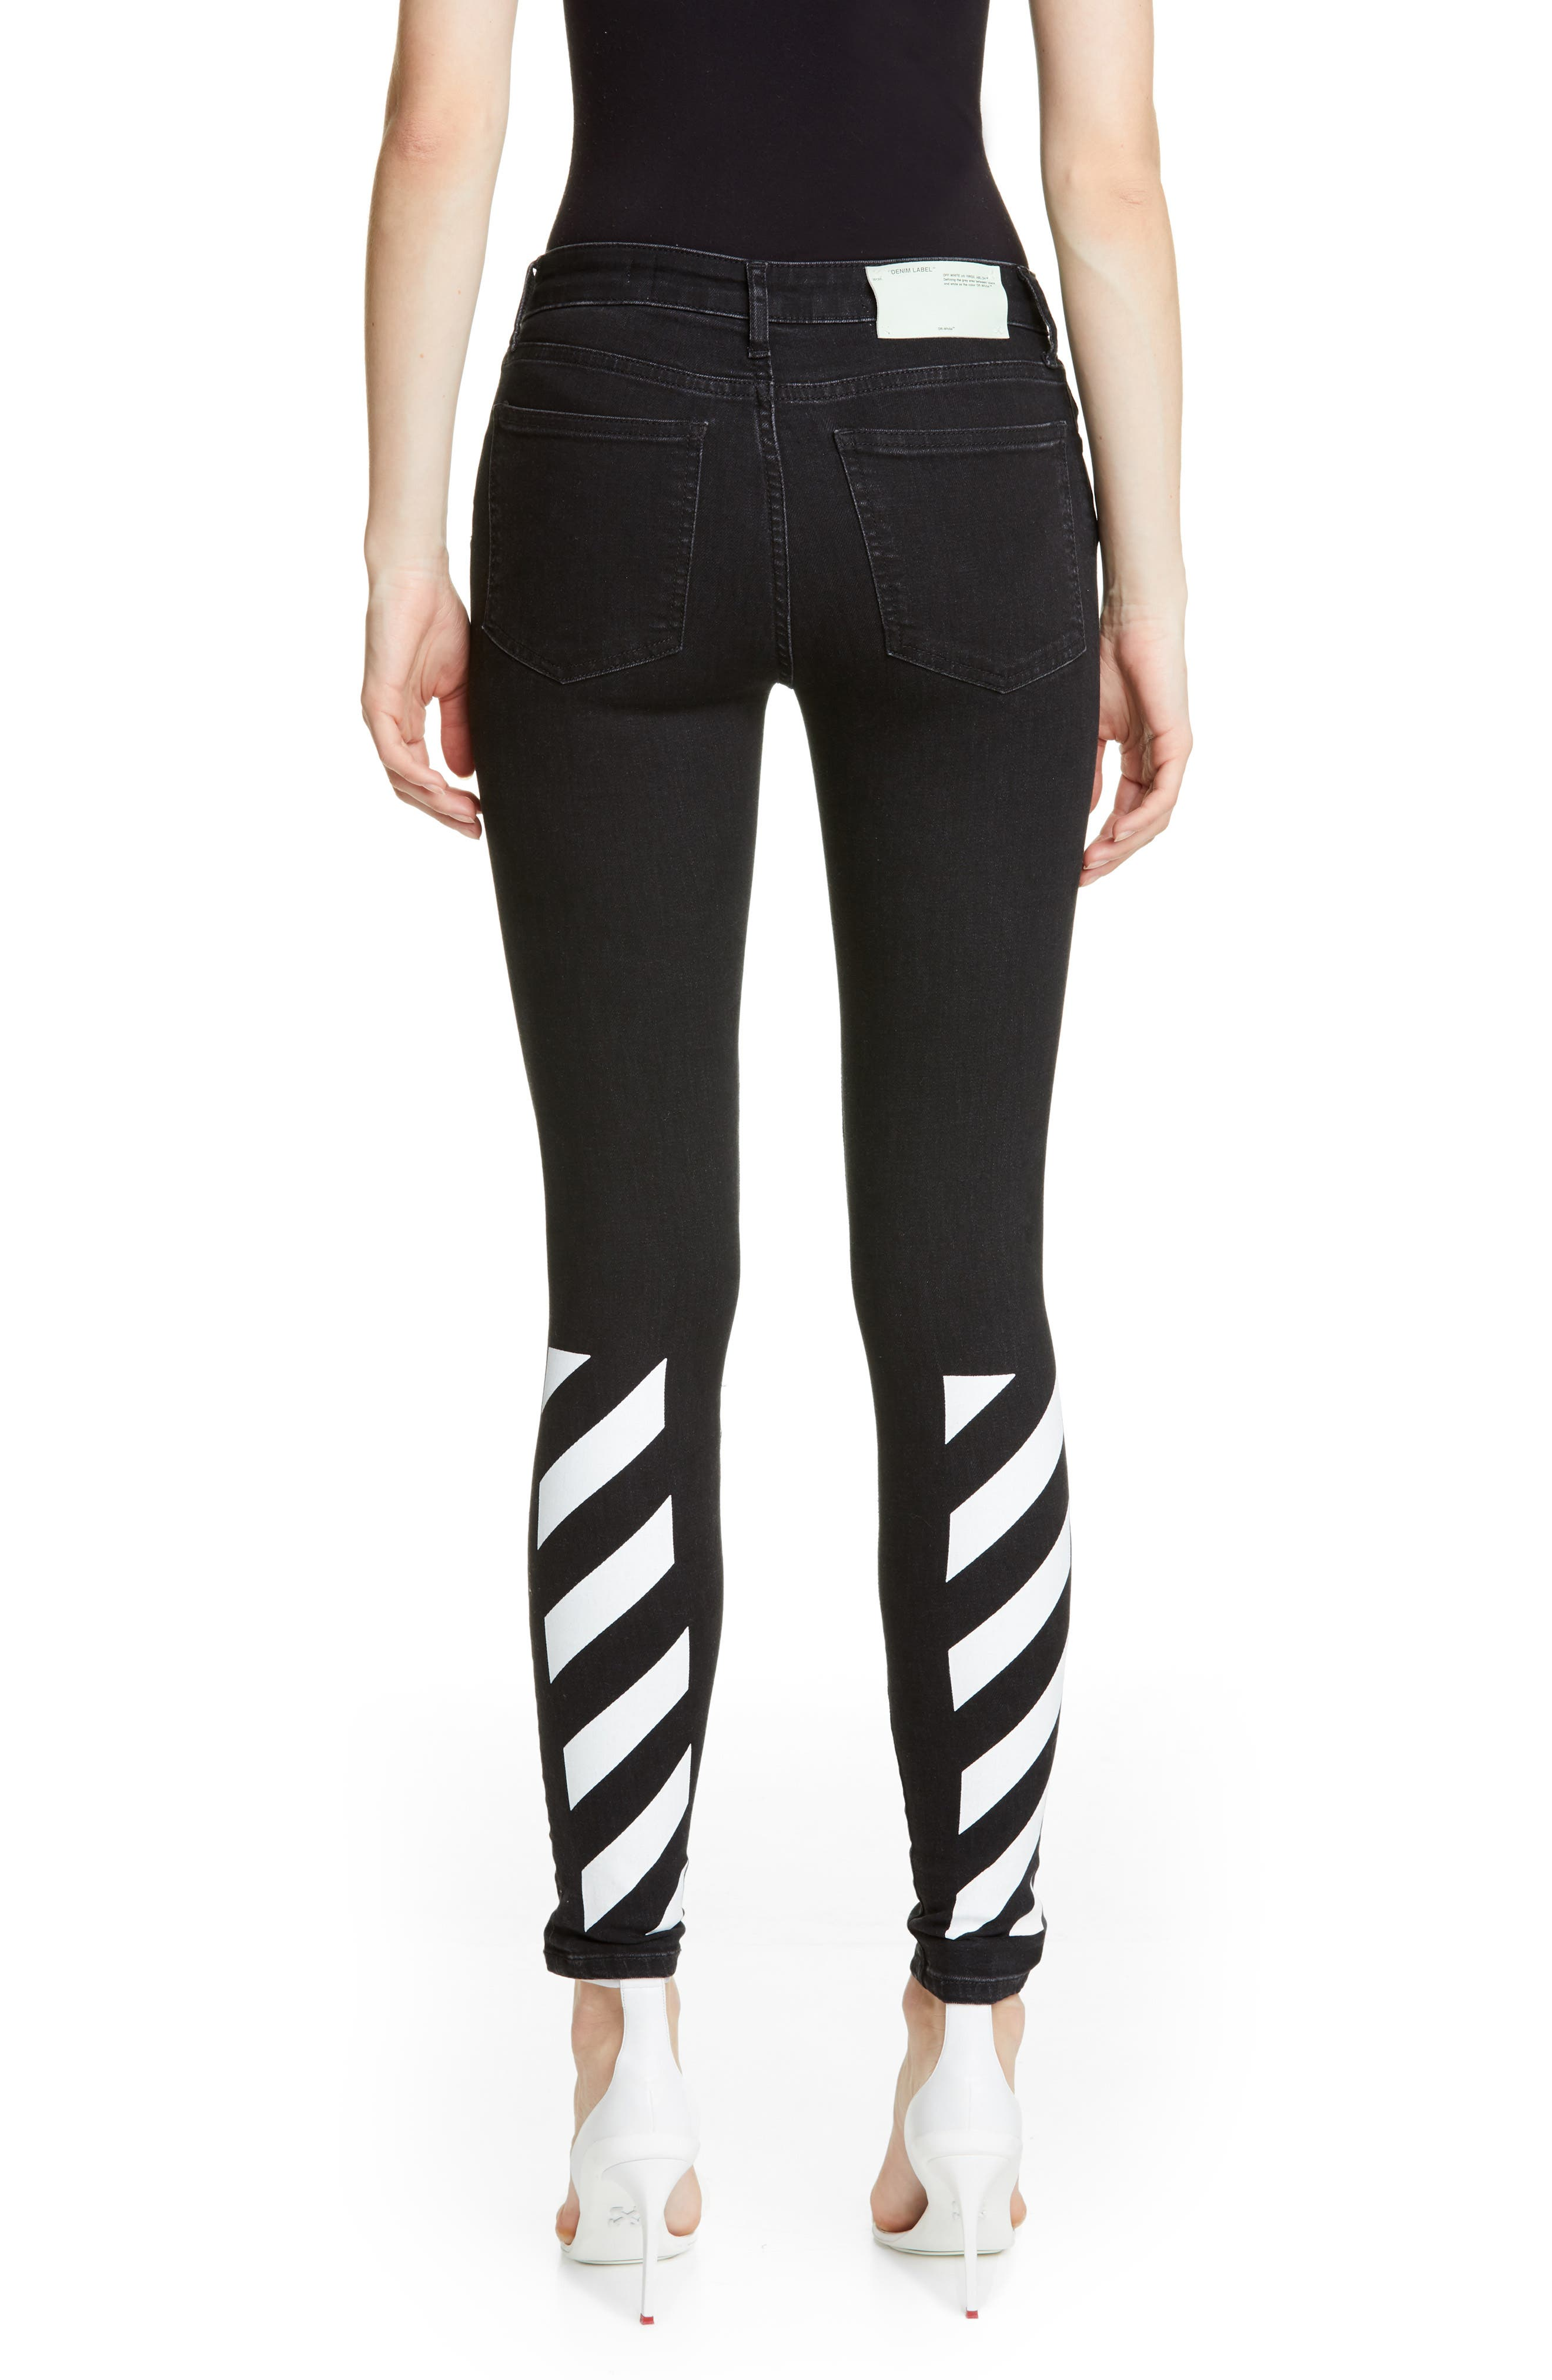 OFF-WHITE, Floral Embroidered Diagonal Stripe Skinny Jeans, Alternate thumbnail 2, color, VINTAGE BLACK